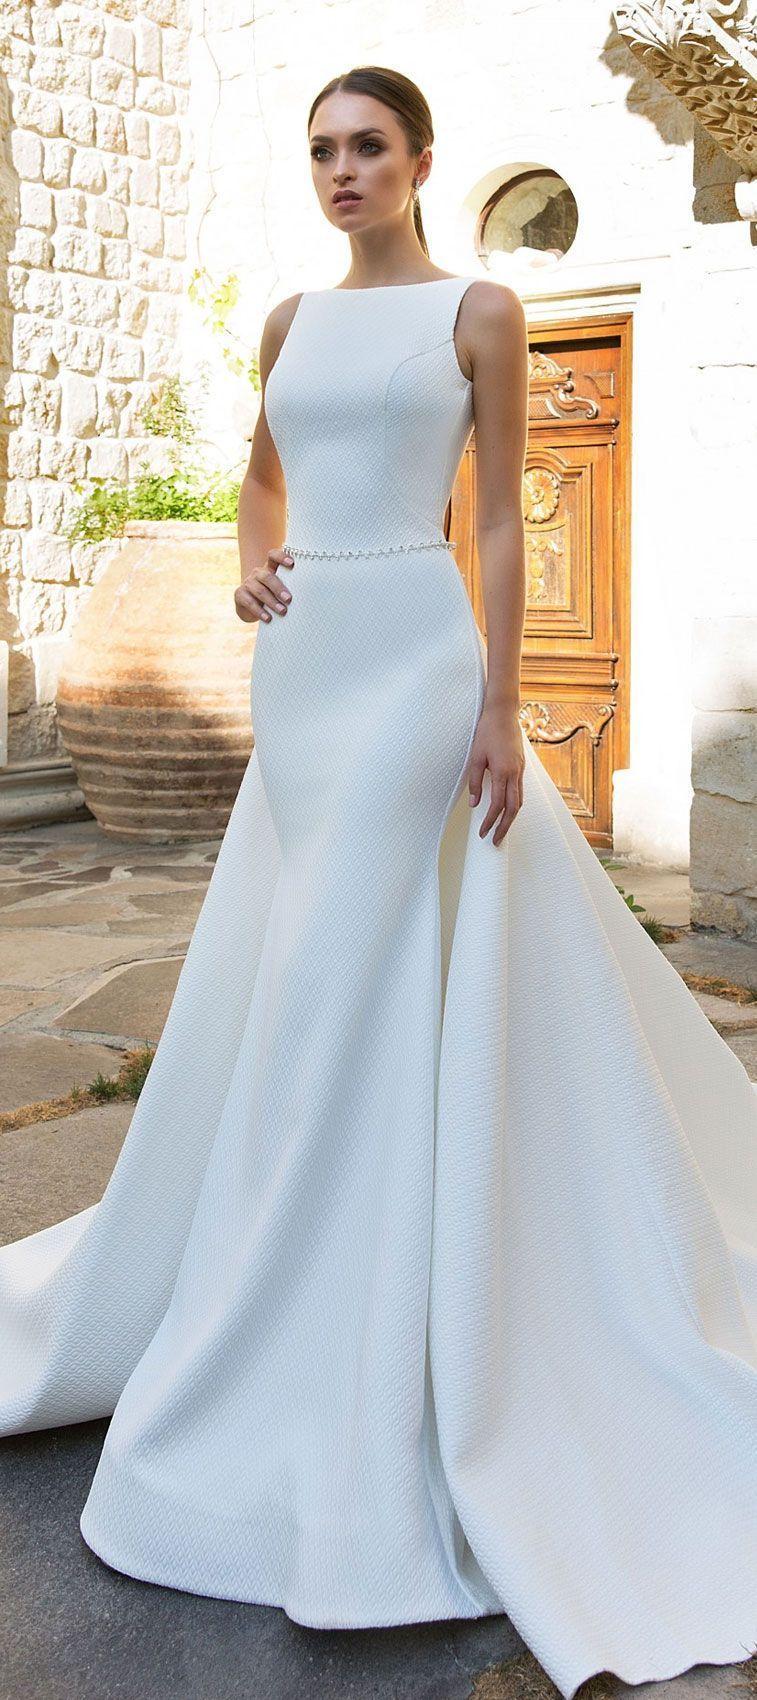 Unusual Michael Cinco Wedding Dresses Price Contemporary - Wedding ...